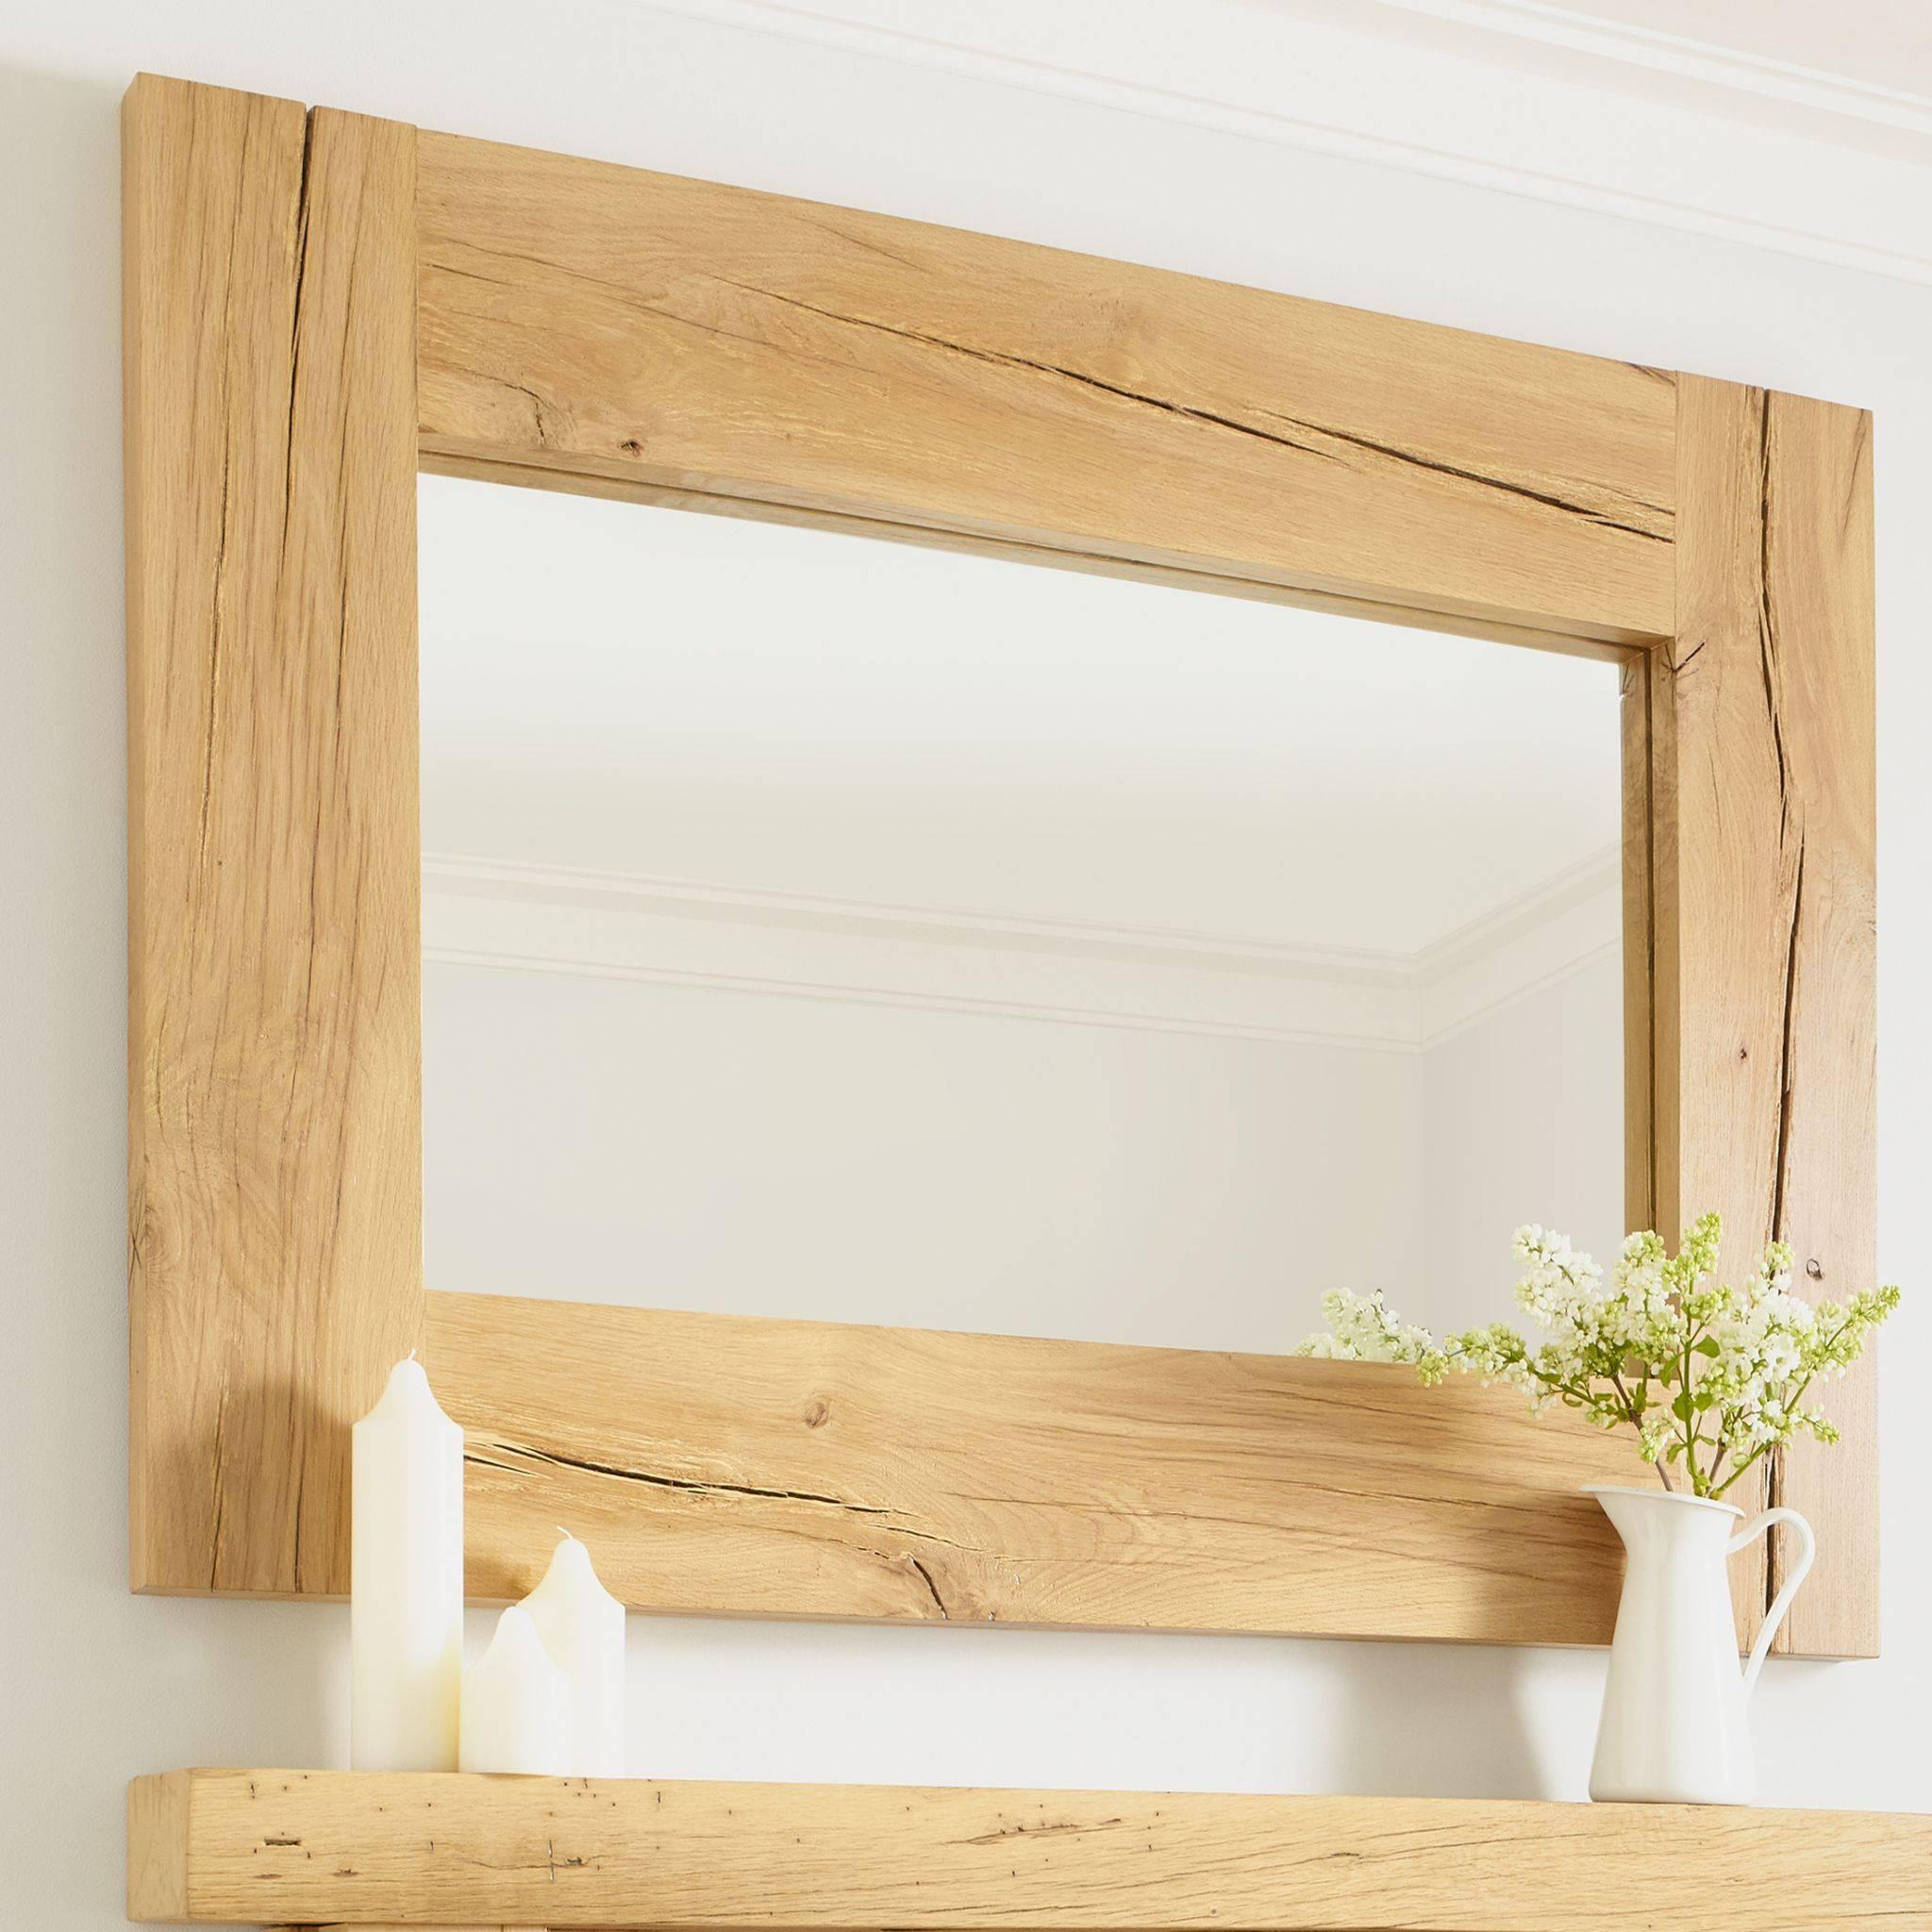 Oak Mirrors regarding Oak Mirrors (Image 12 of 15)